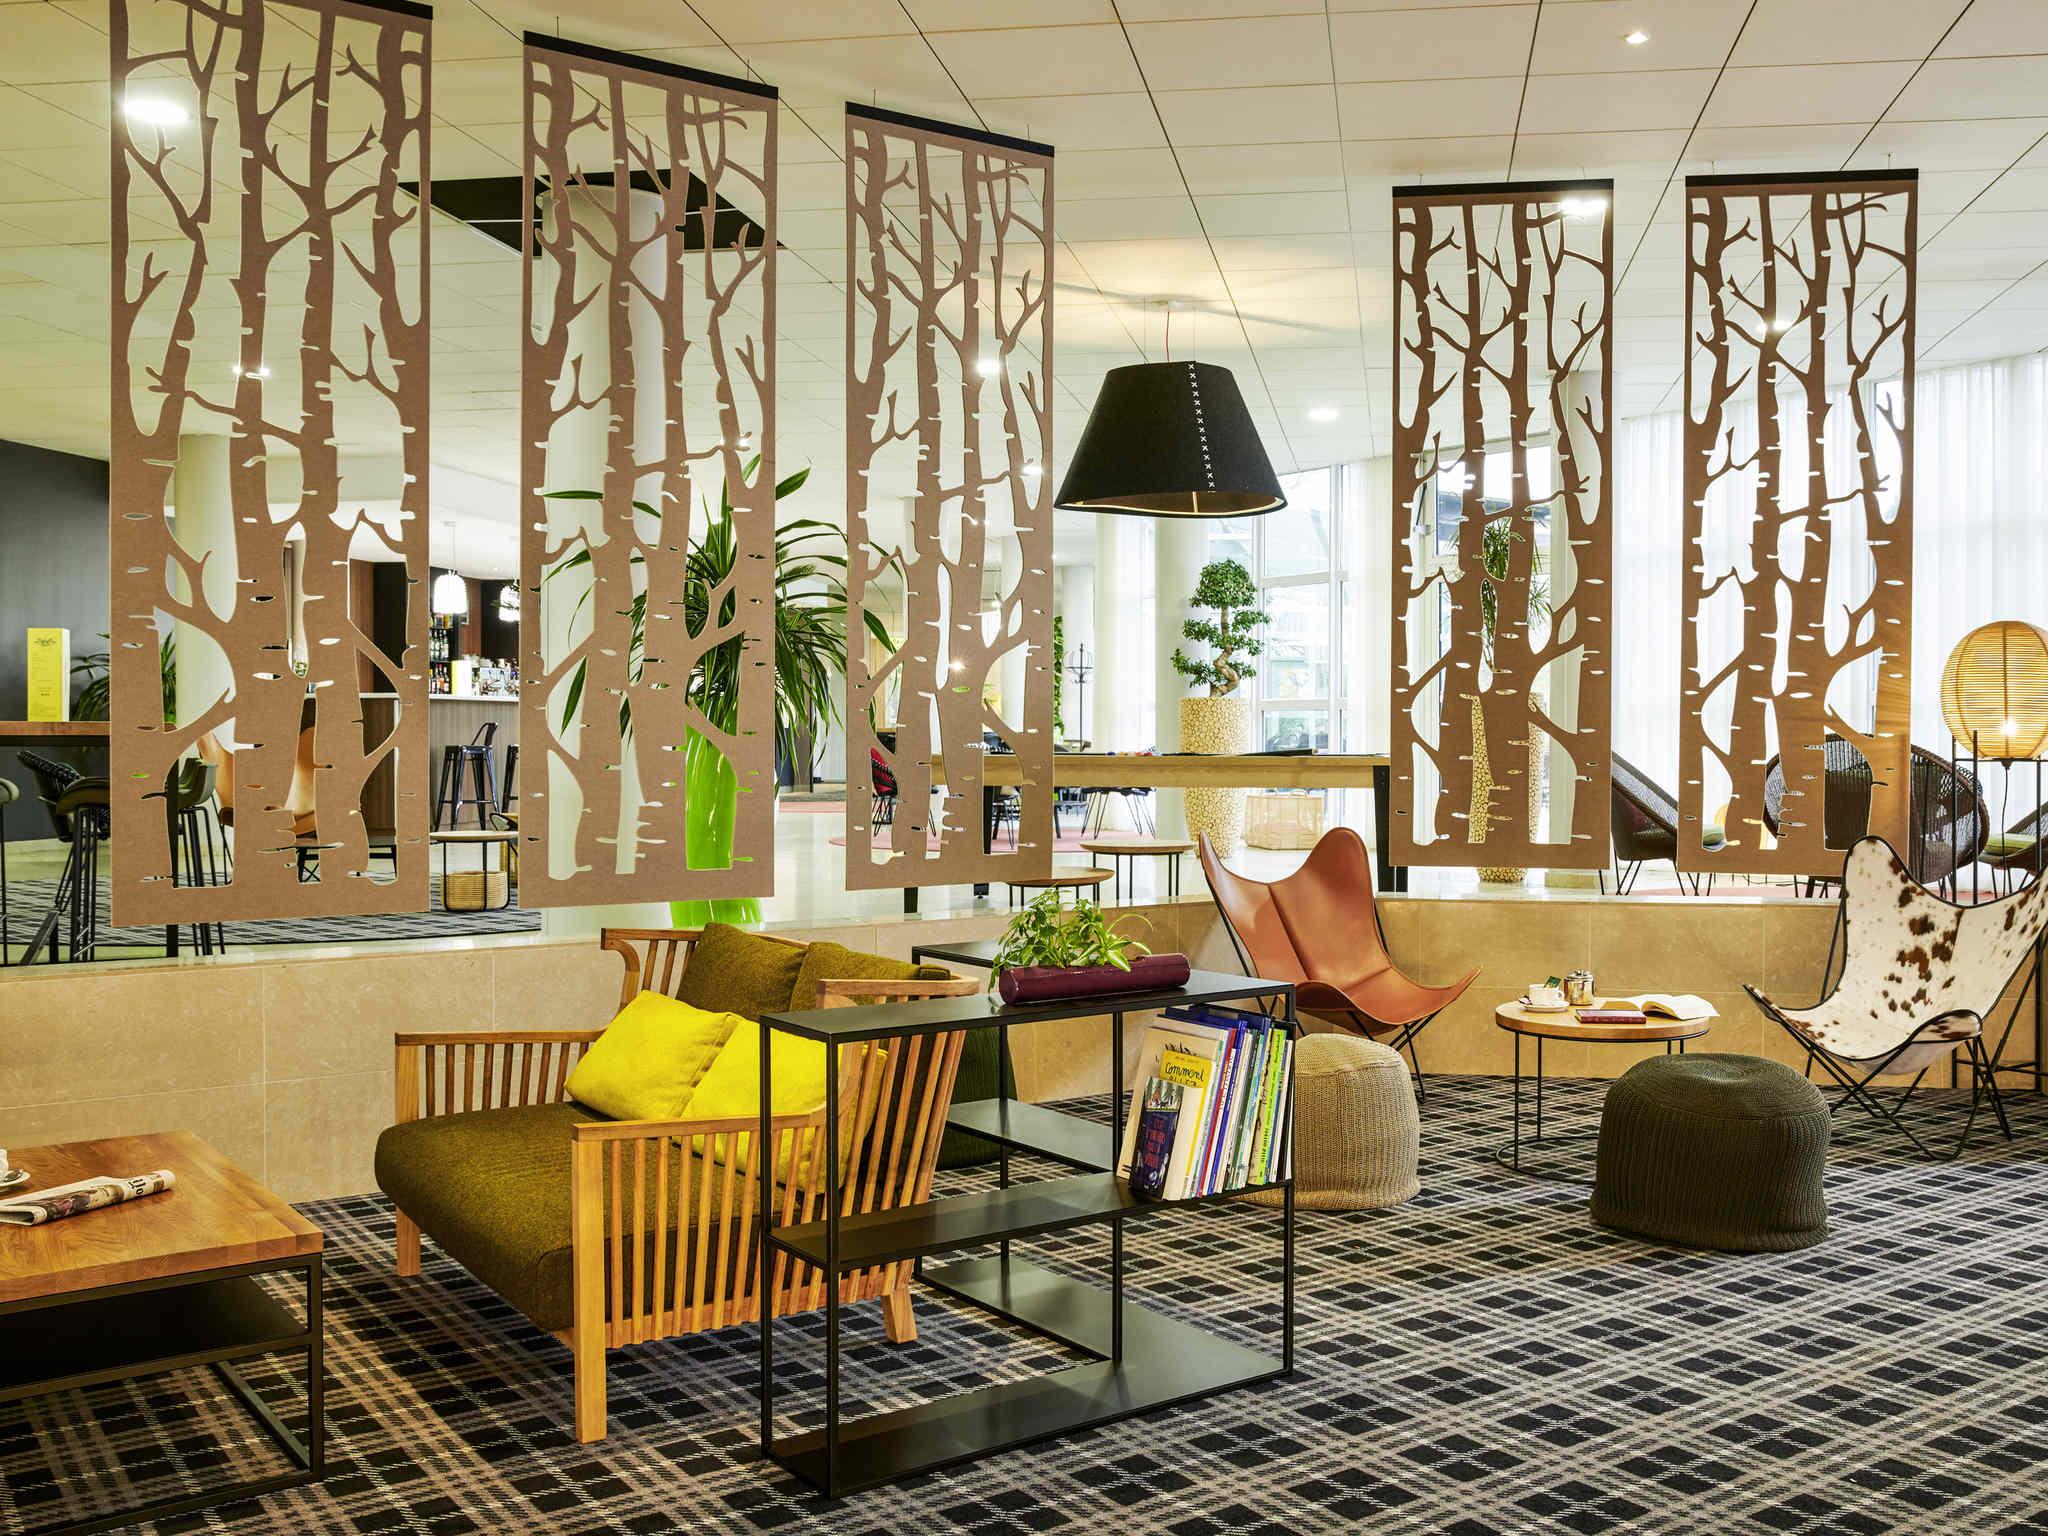 فندق - Novotel Sénart Golf de Greenparc